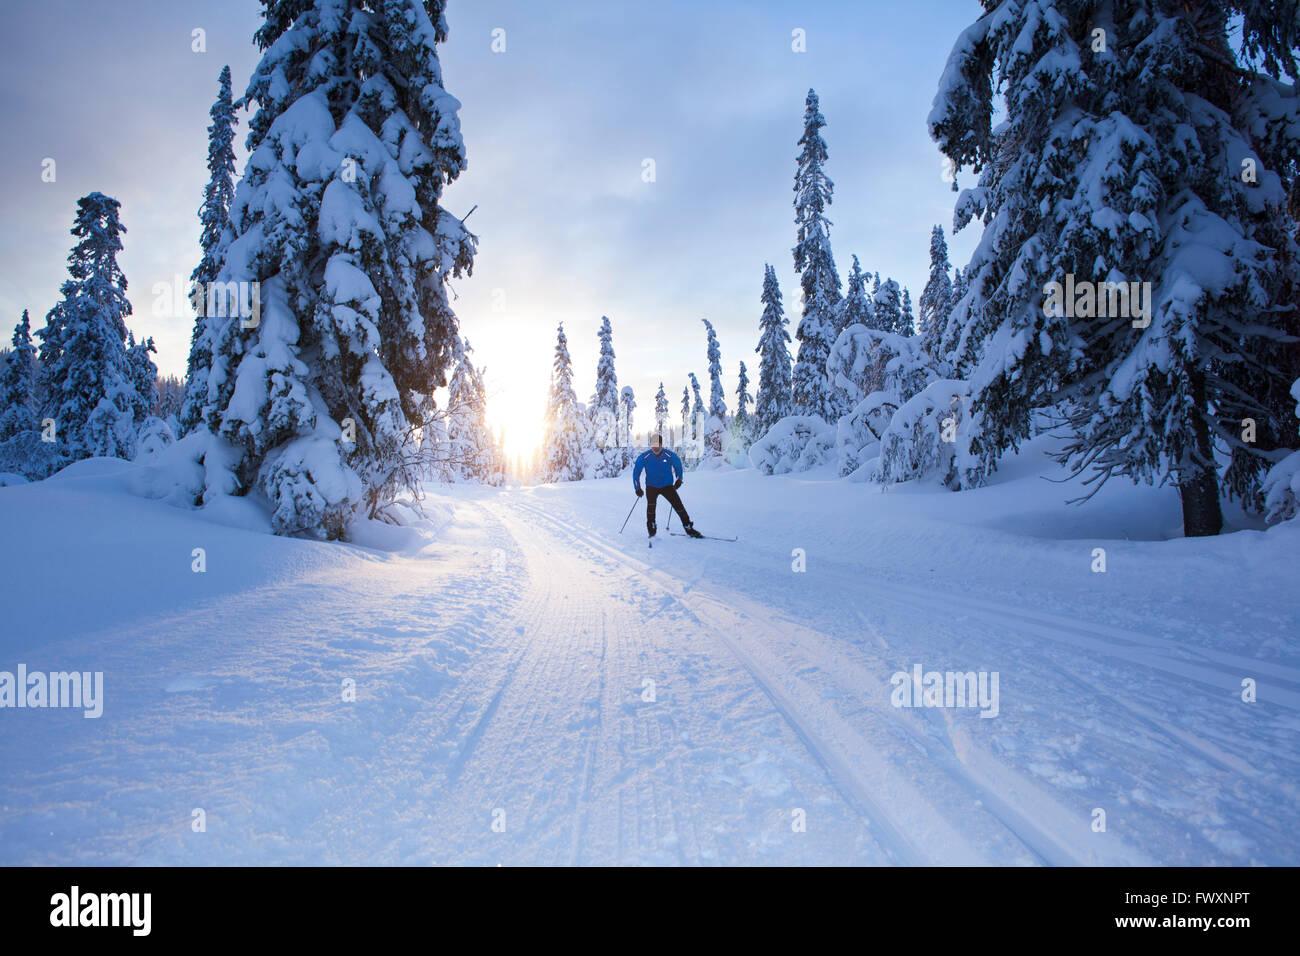 Sweden, Dalarna, Salen, Mature man cross-country skiing at dusk Stock Photo